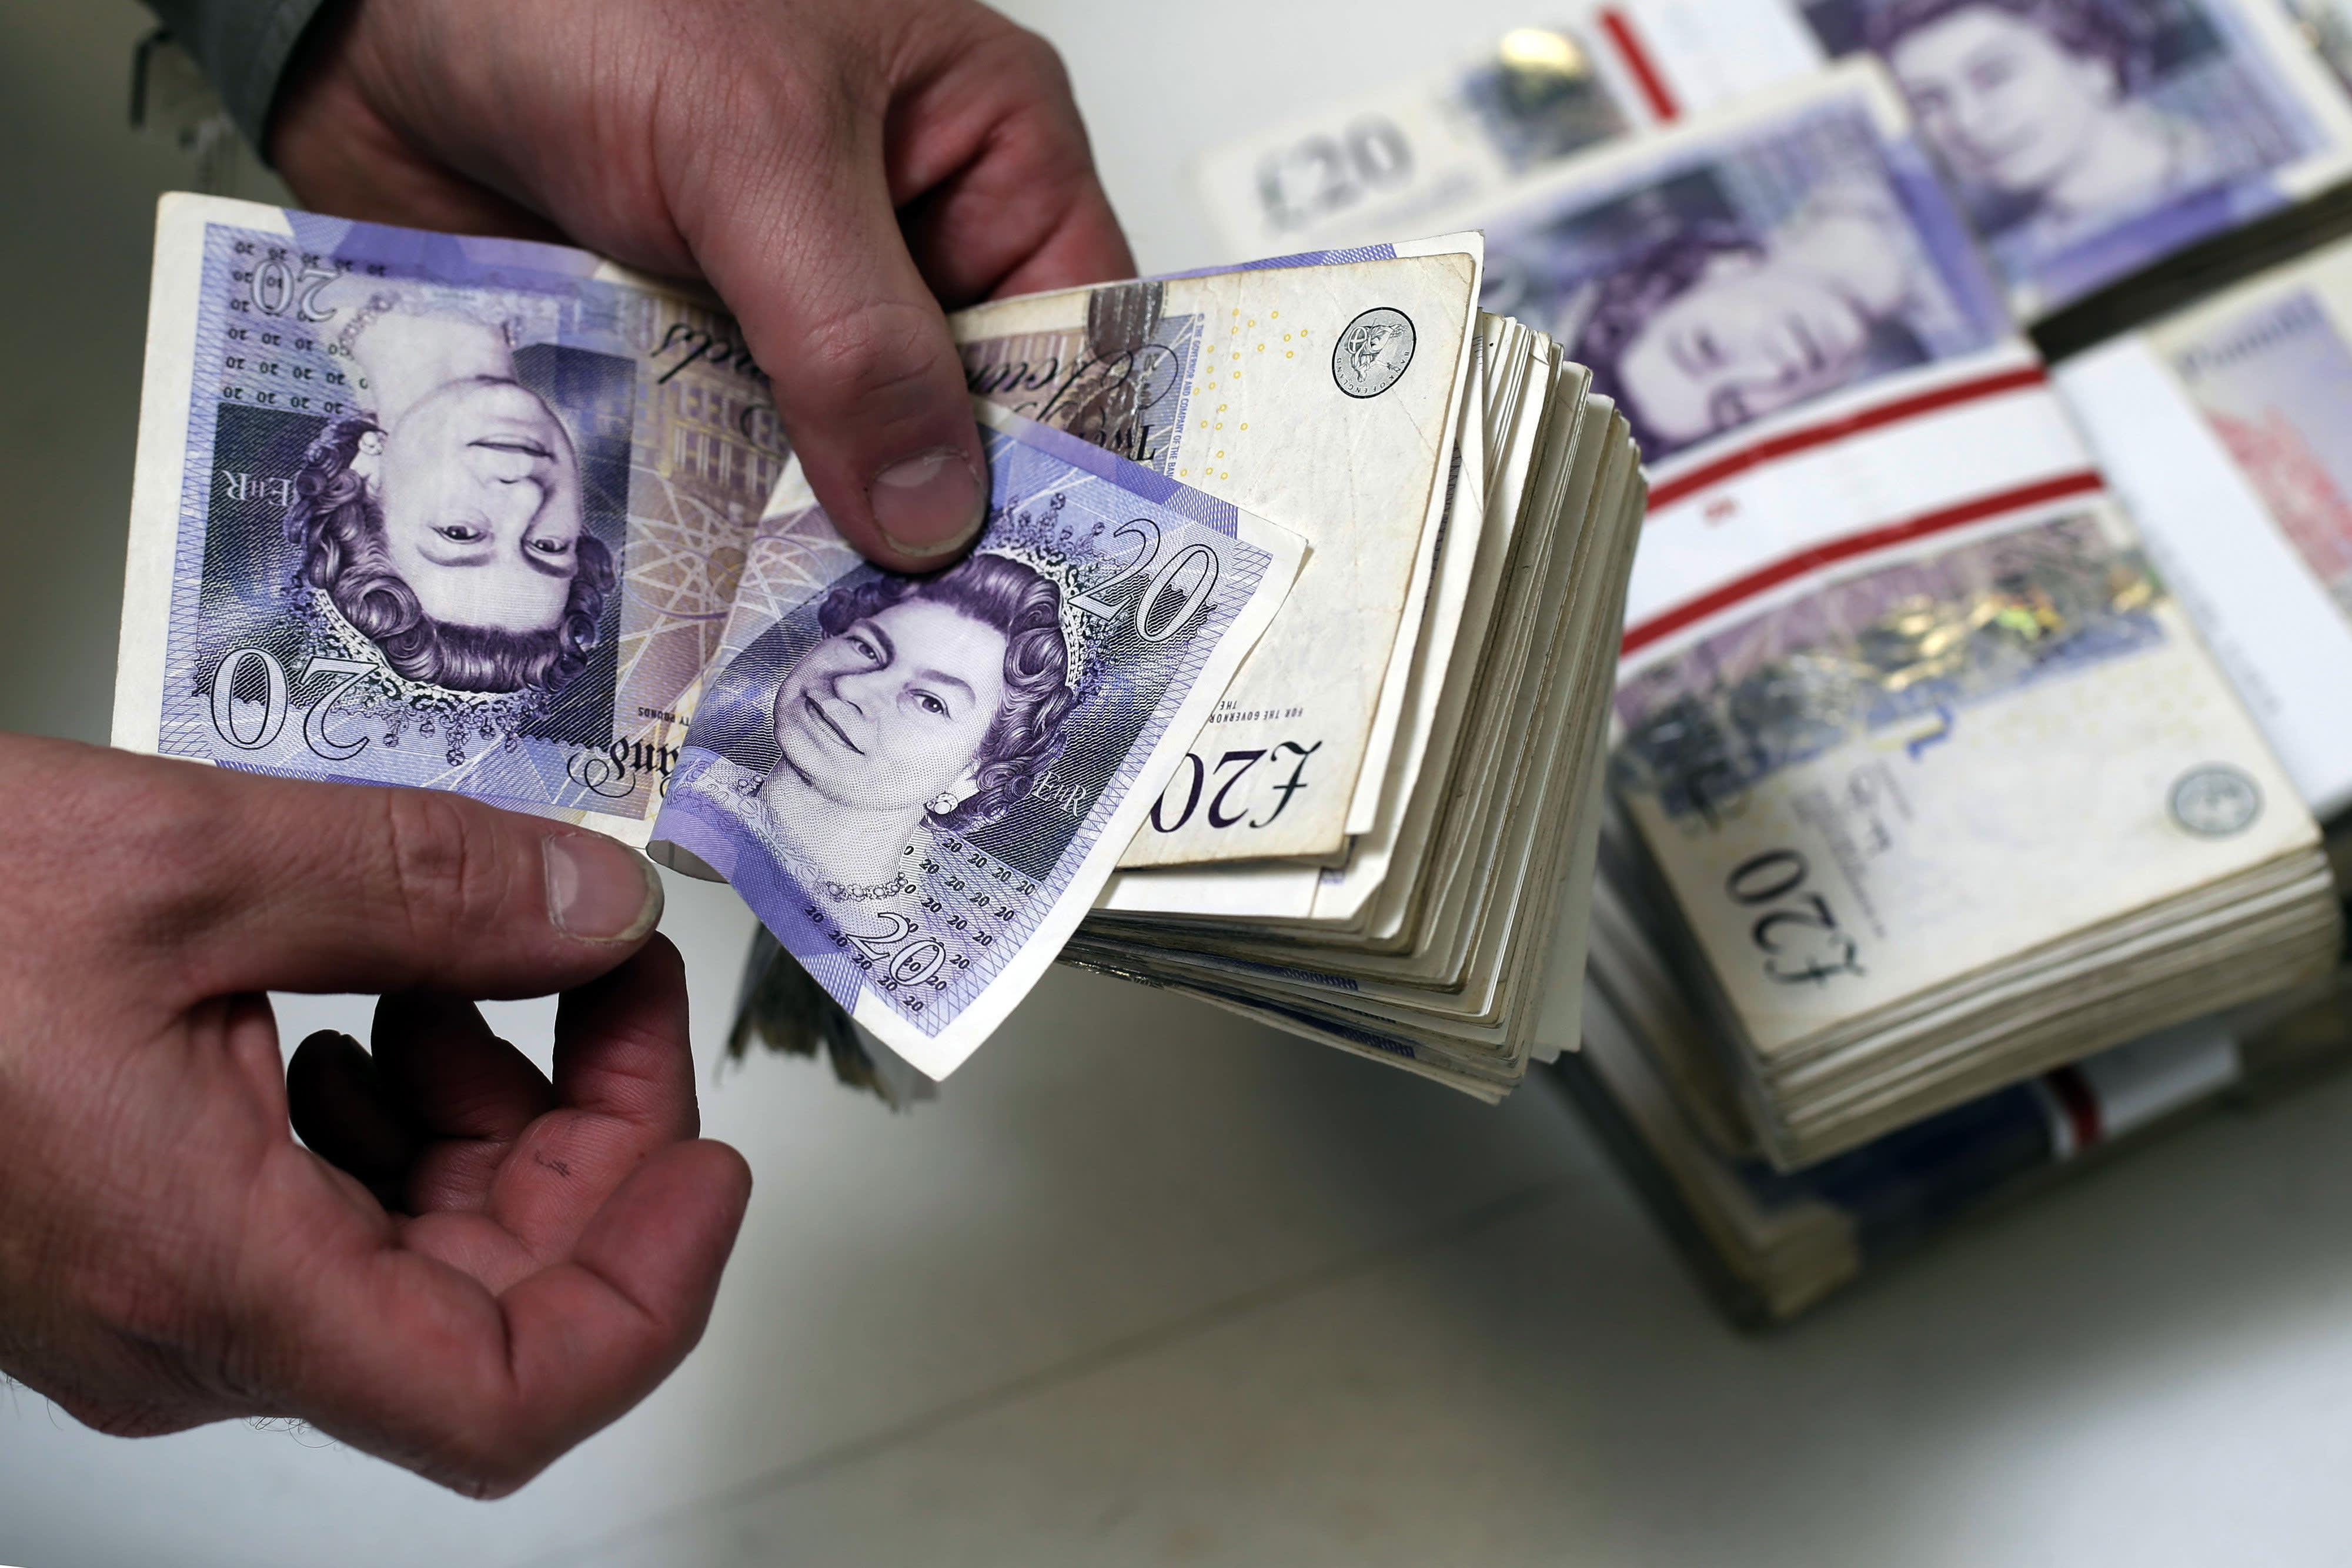 Investors told to avoid gilts despite economic weakness